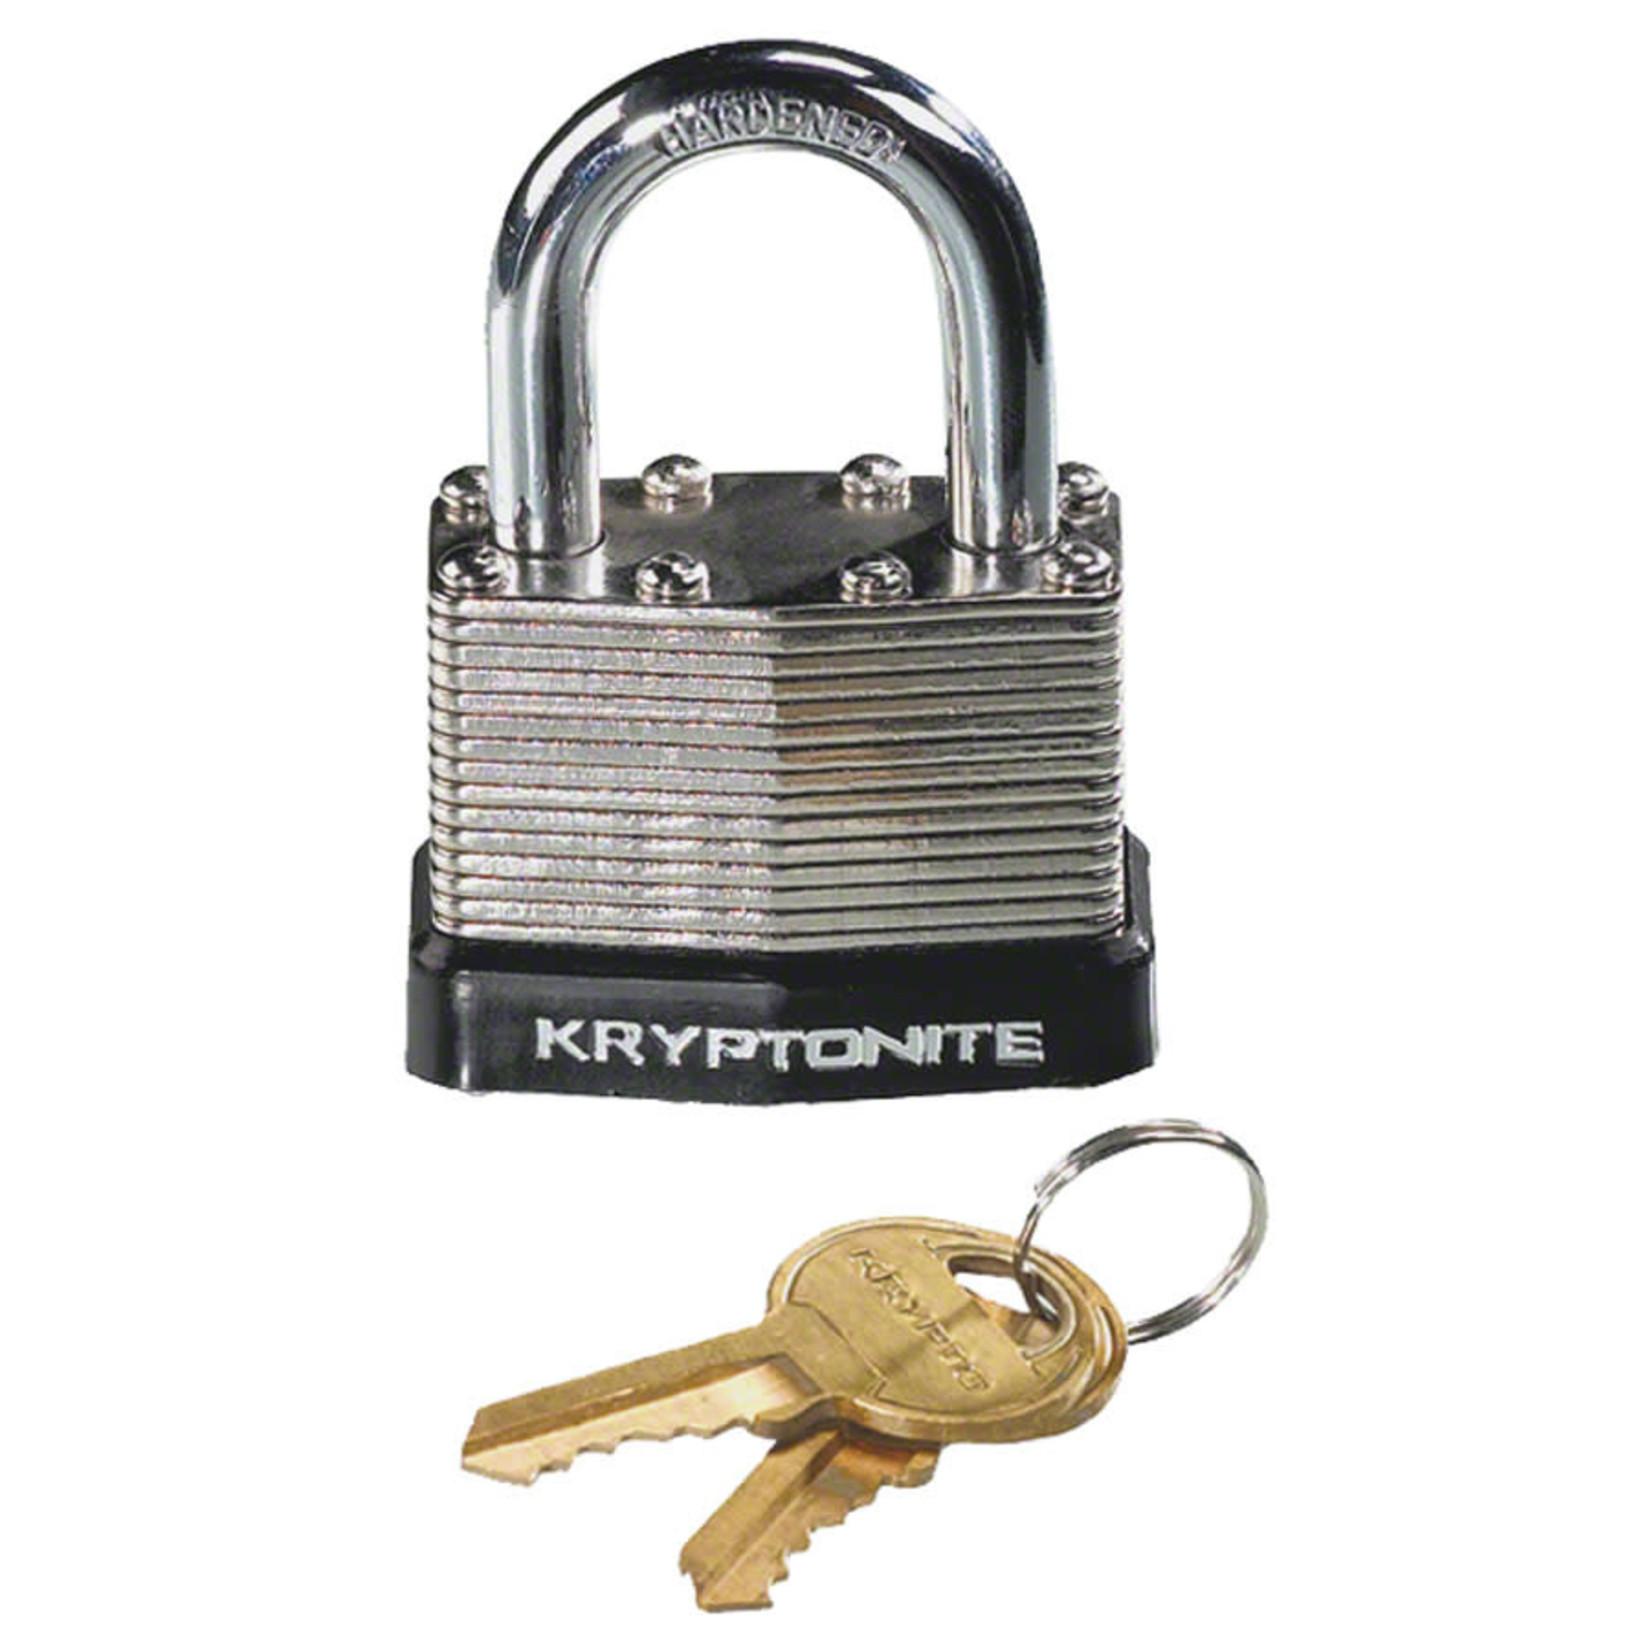 Kryptonite Kryptonite Laminated Steel Padlock with Flat Key